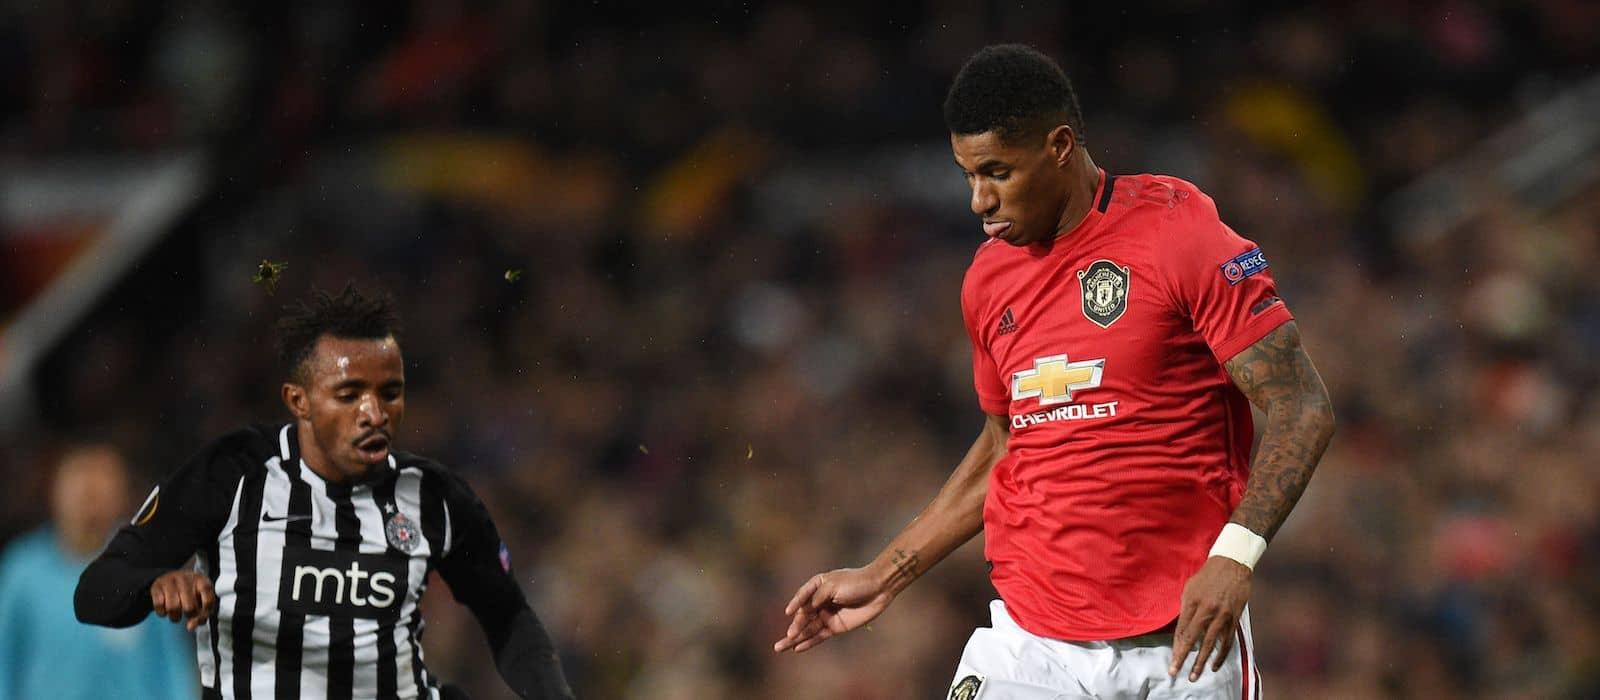 Marcus Rashford Manchester United's go-to man in big clashes